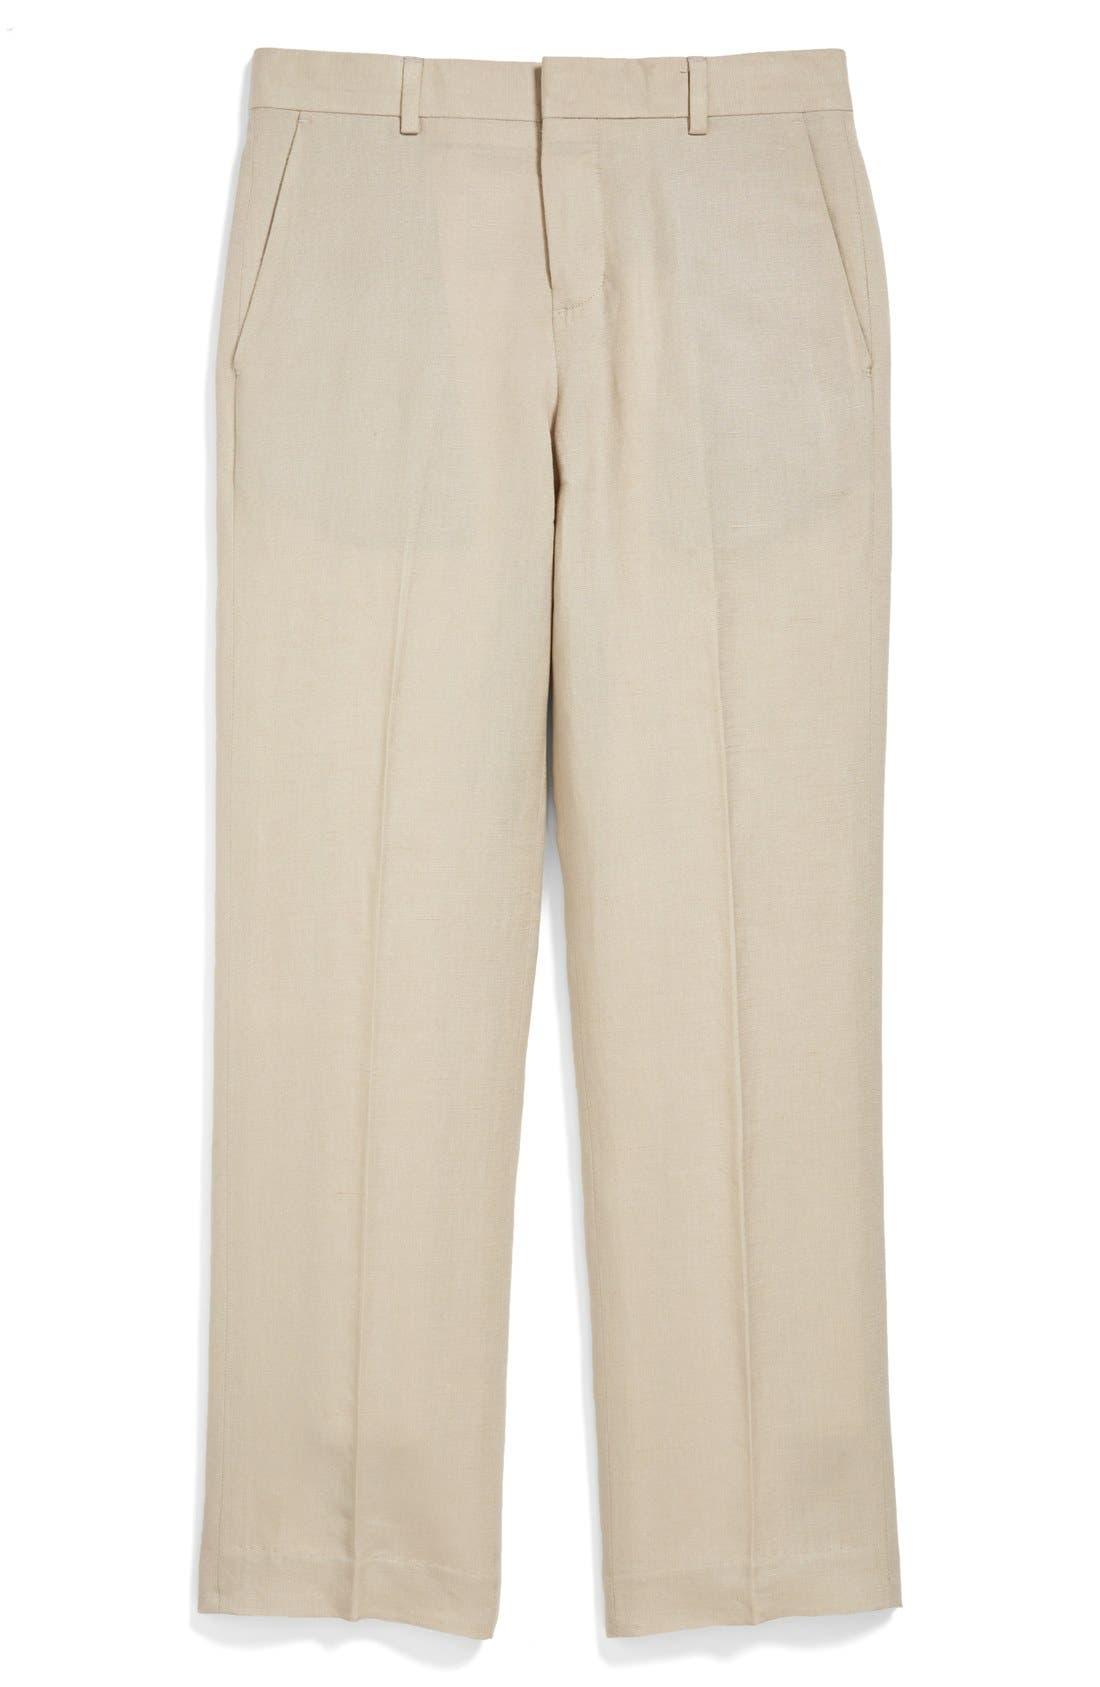 NORDSTROM,                             'Quentin' Linen Blend Trousers,                             Main thumbnail 1, color,                             250